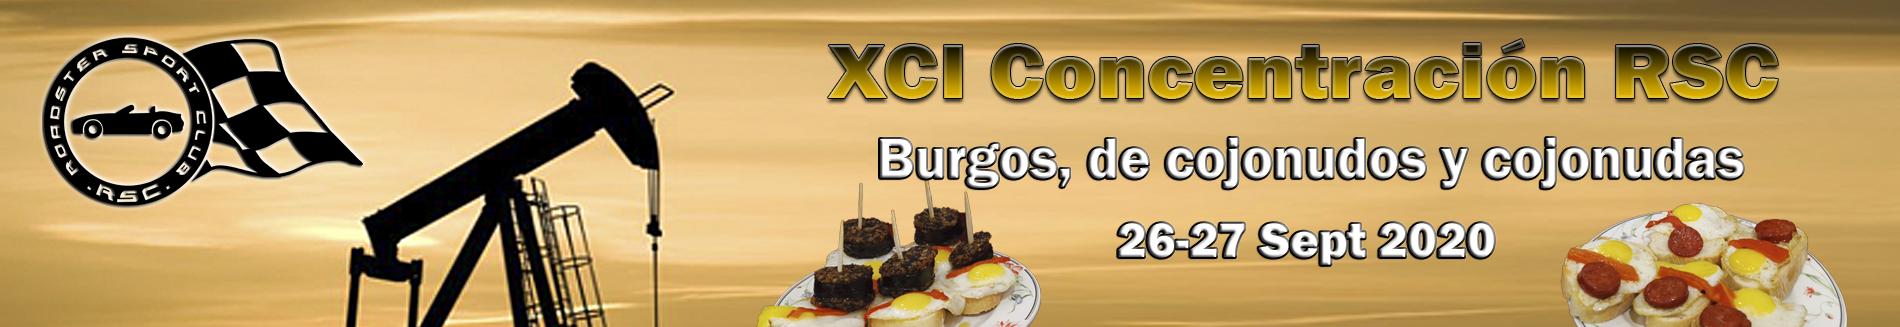 XCI Concentración: De cojonudos y cojonudas